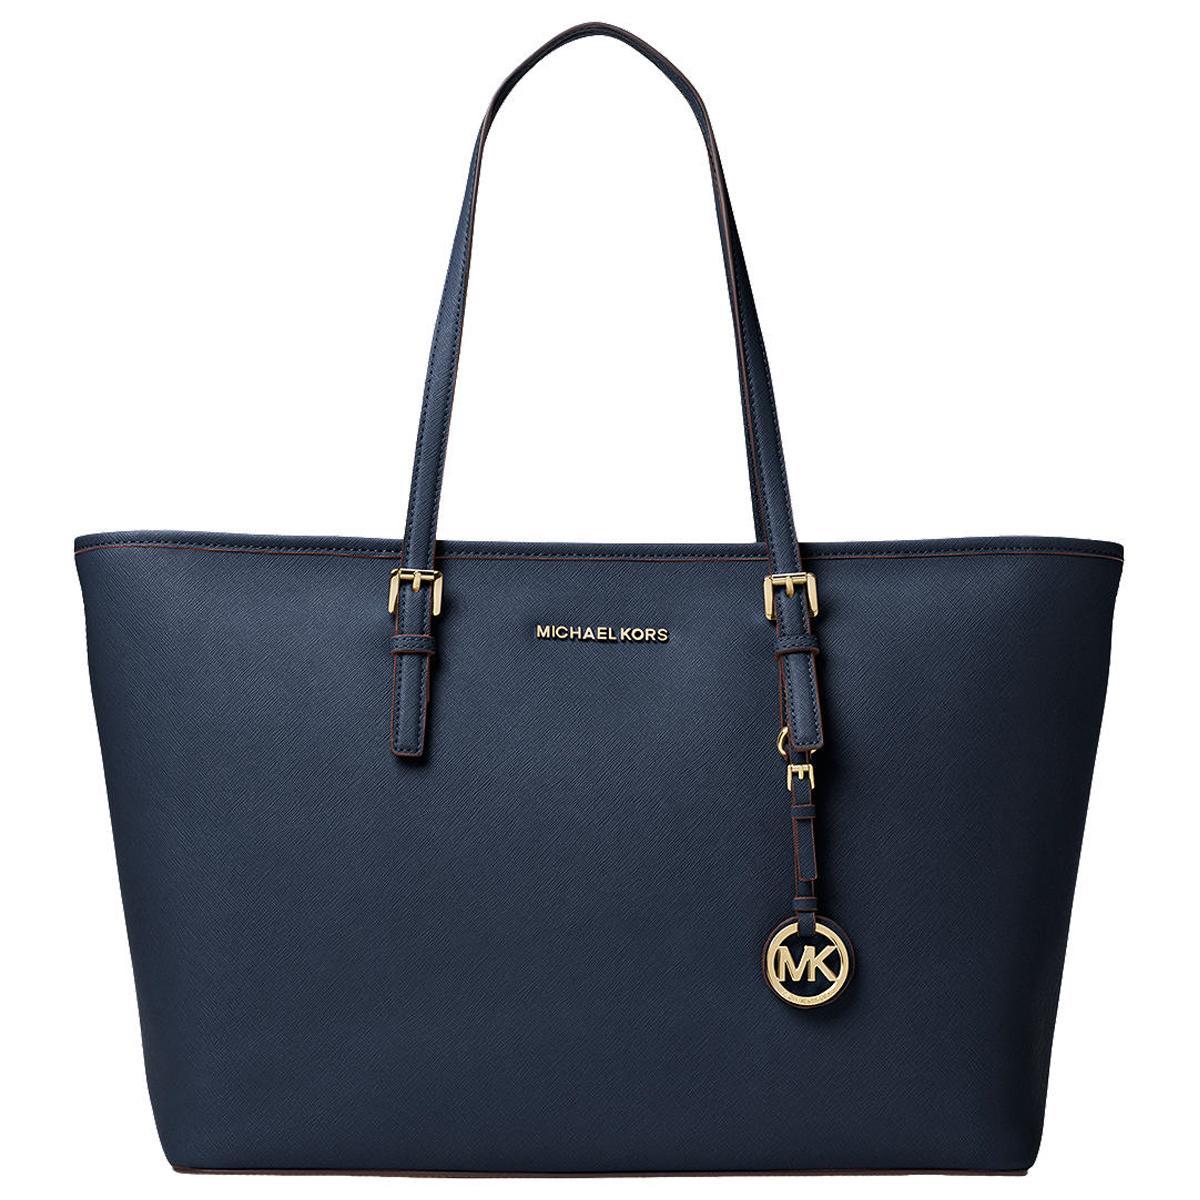 classic-designer-handbag-brands-271996-1541601778378-product.1200x0c.jpg (1200×1200)